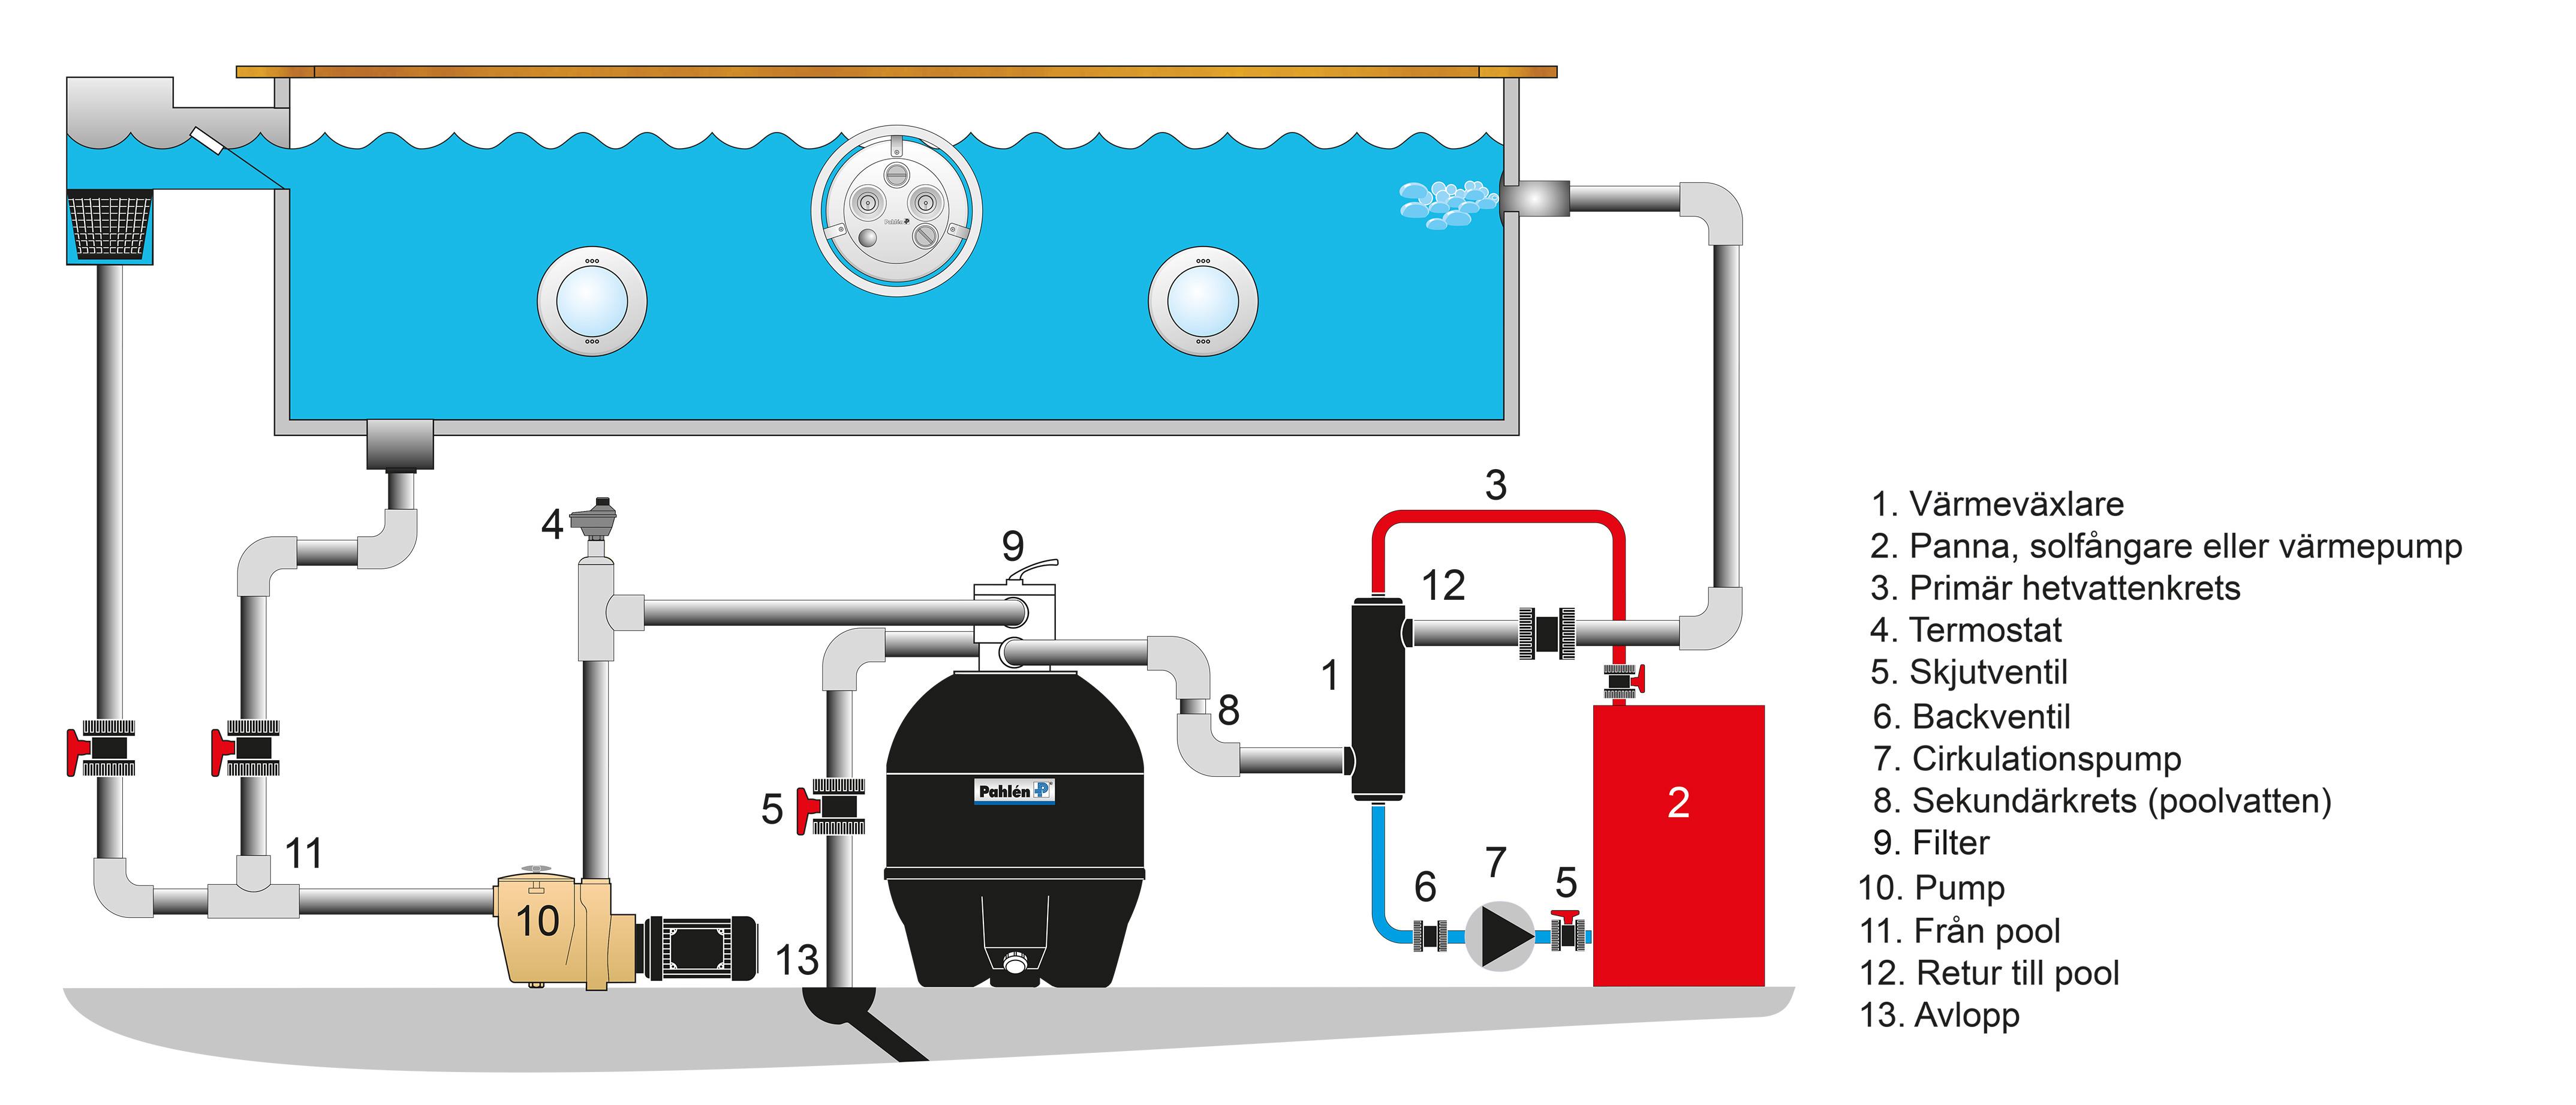 pool pump setup diagram kotter change model swimming schematic heat exchanger electric heater